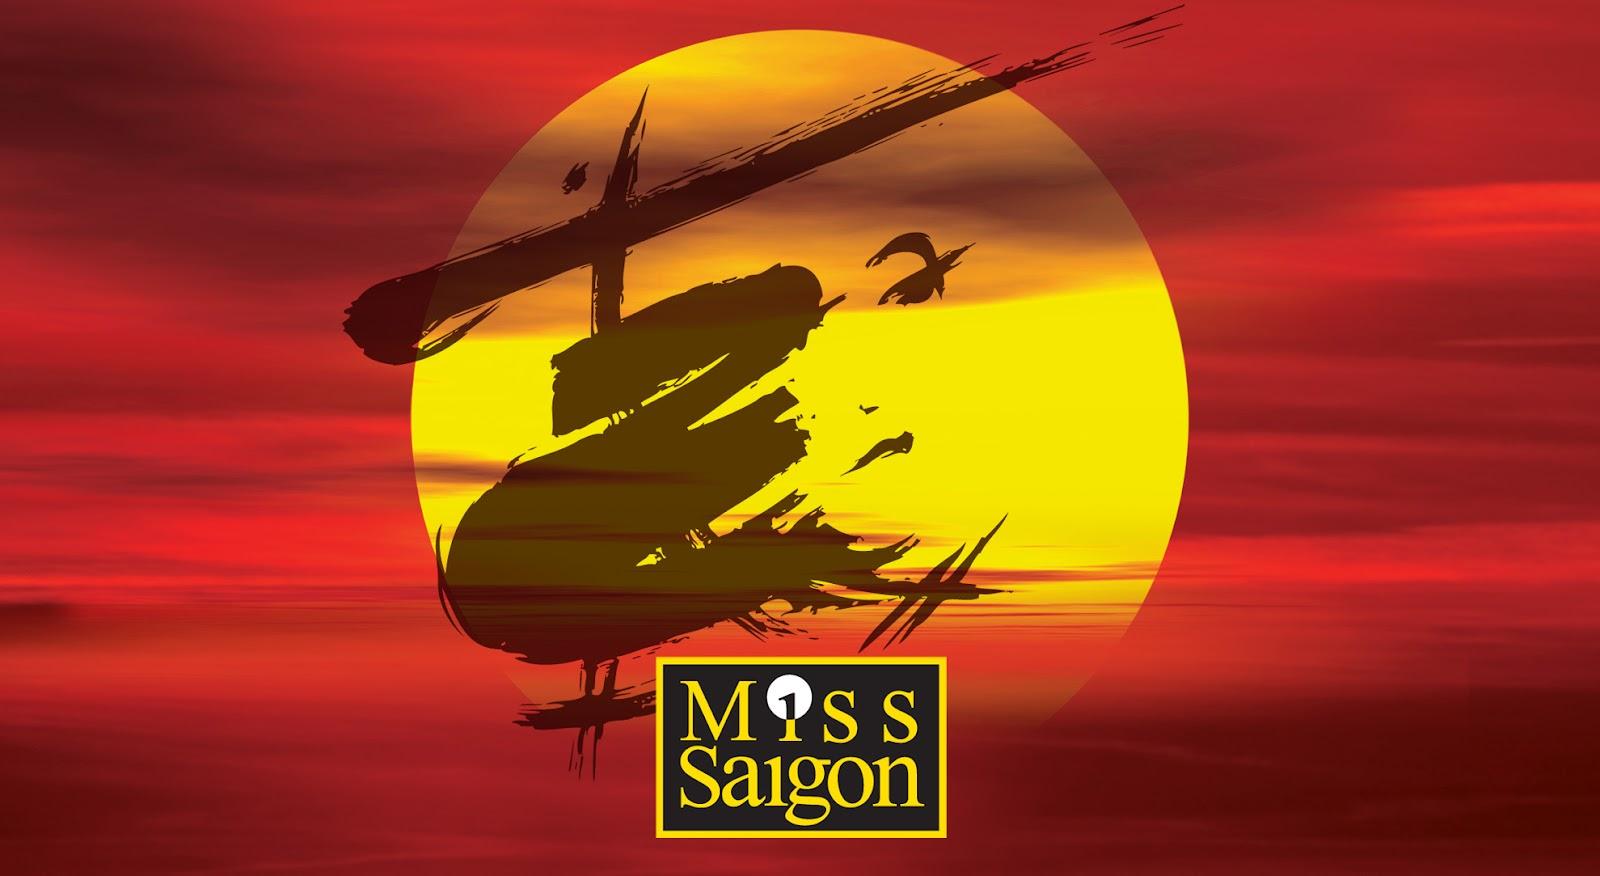 Miss Saigon is Simply Beautiful - The Three Tomatoes